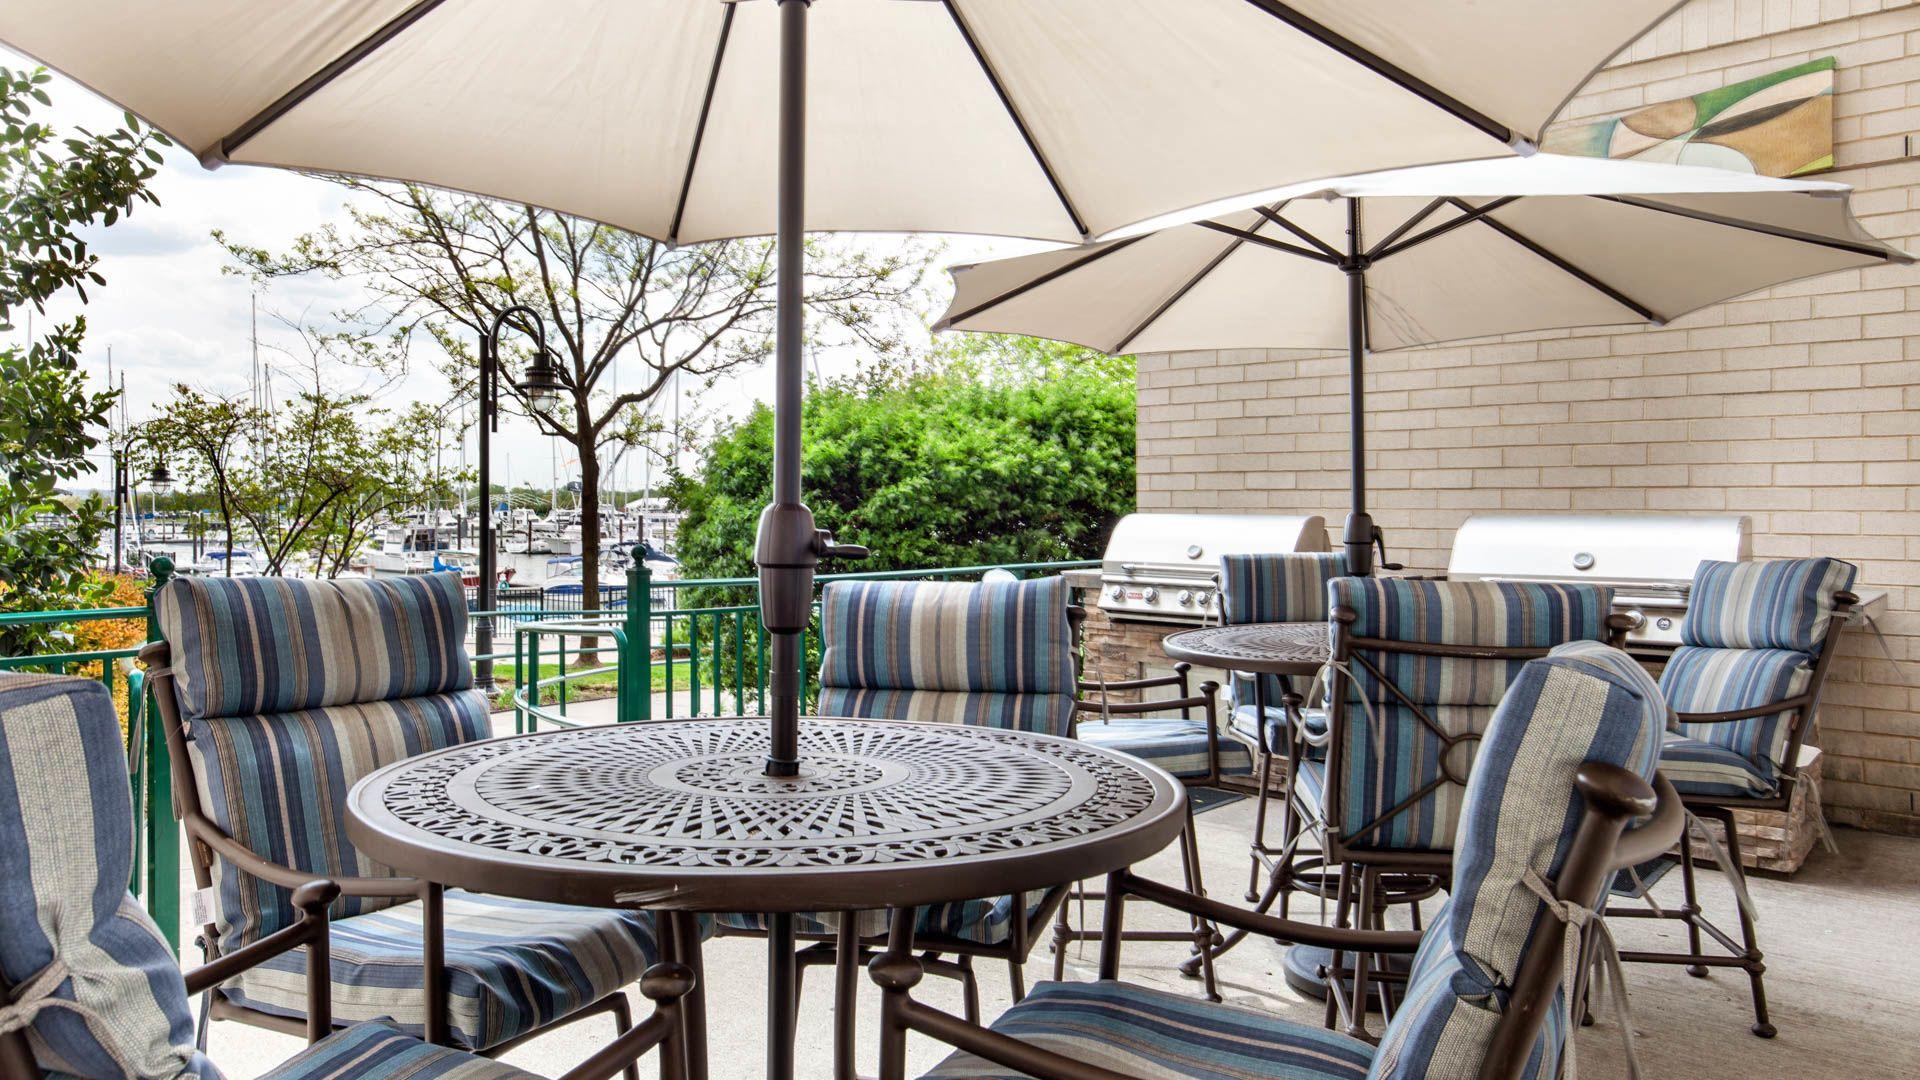 Hudson Point Apartments - Patio